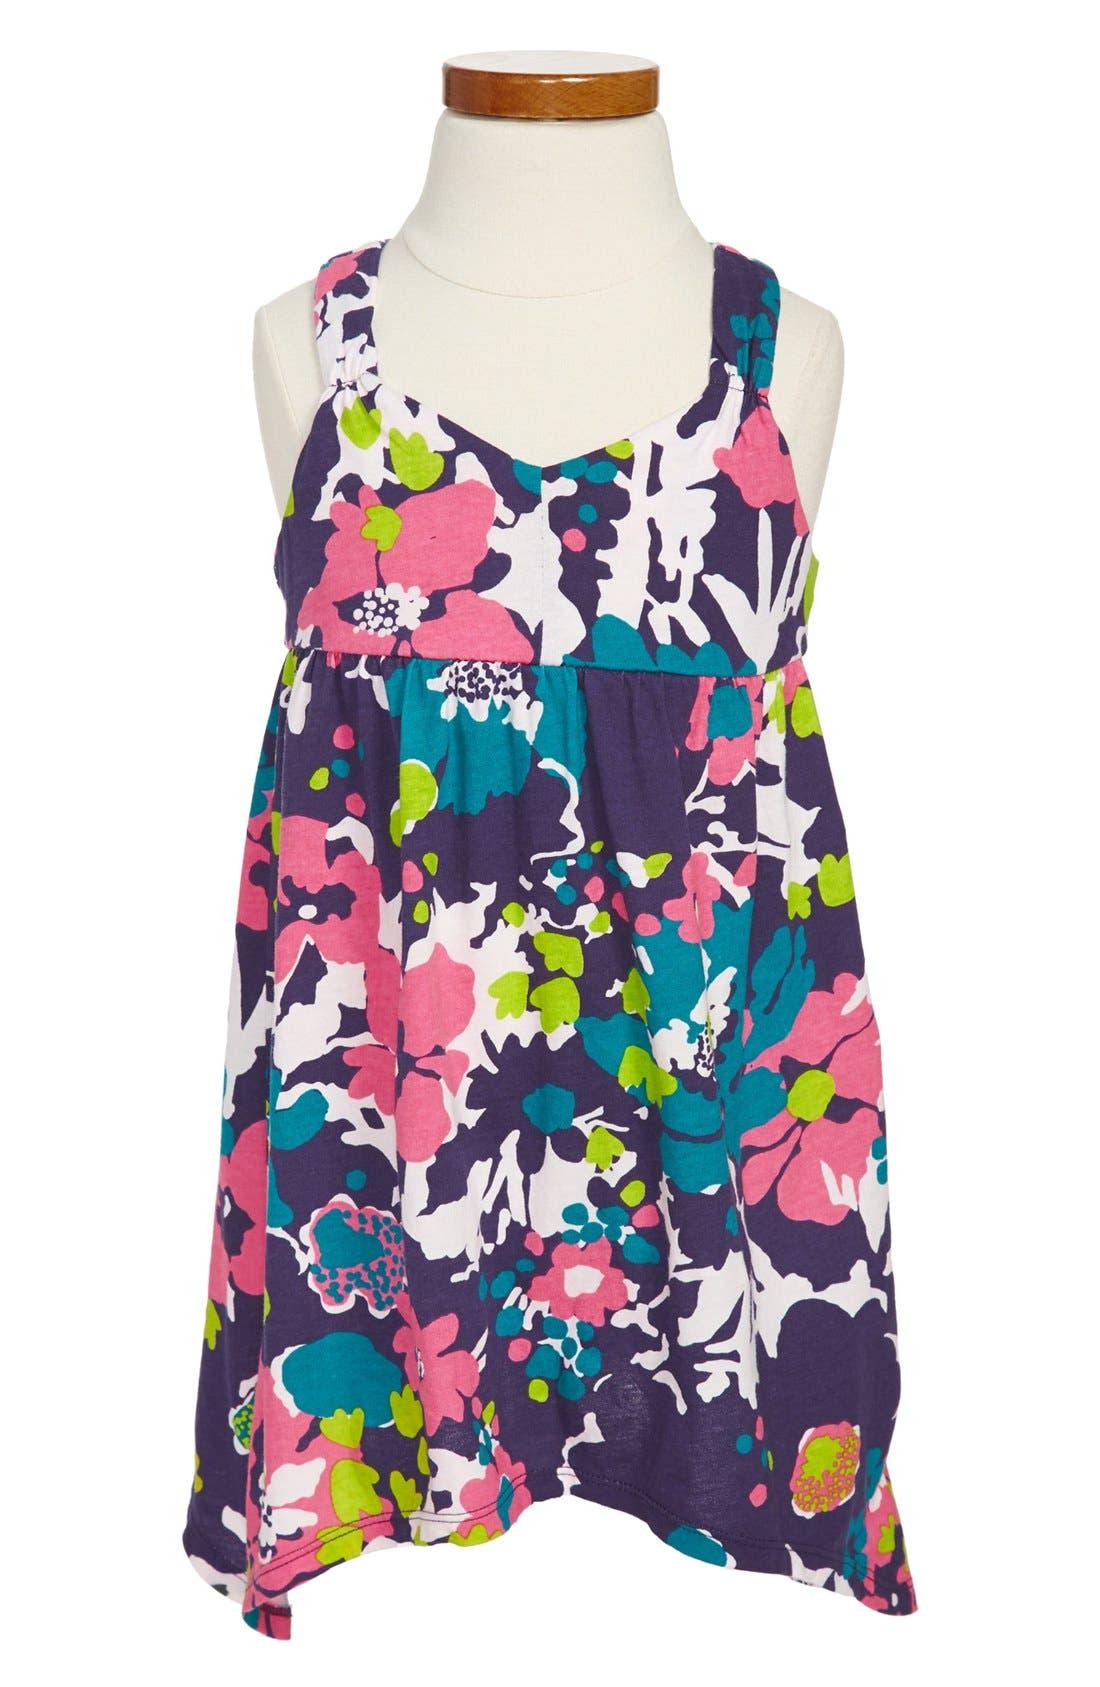 Main Image - Roxy 'Bay Hill' Sleeveless Dress (Toddler Girls)